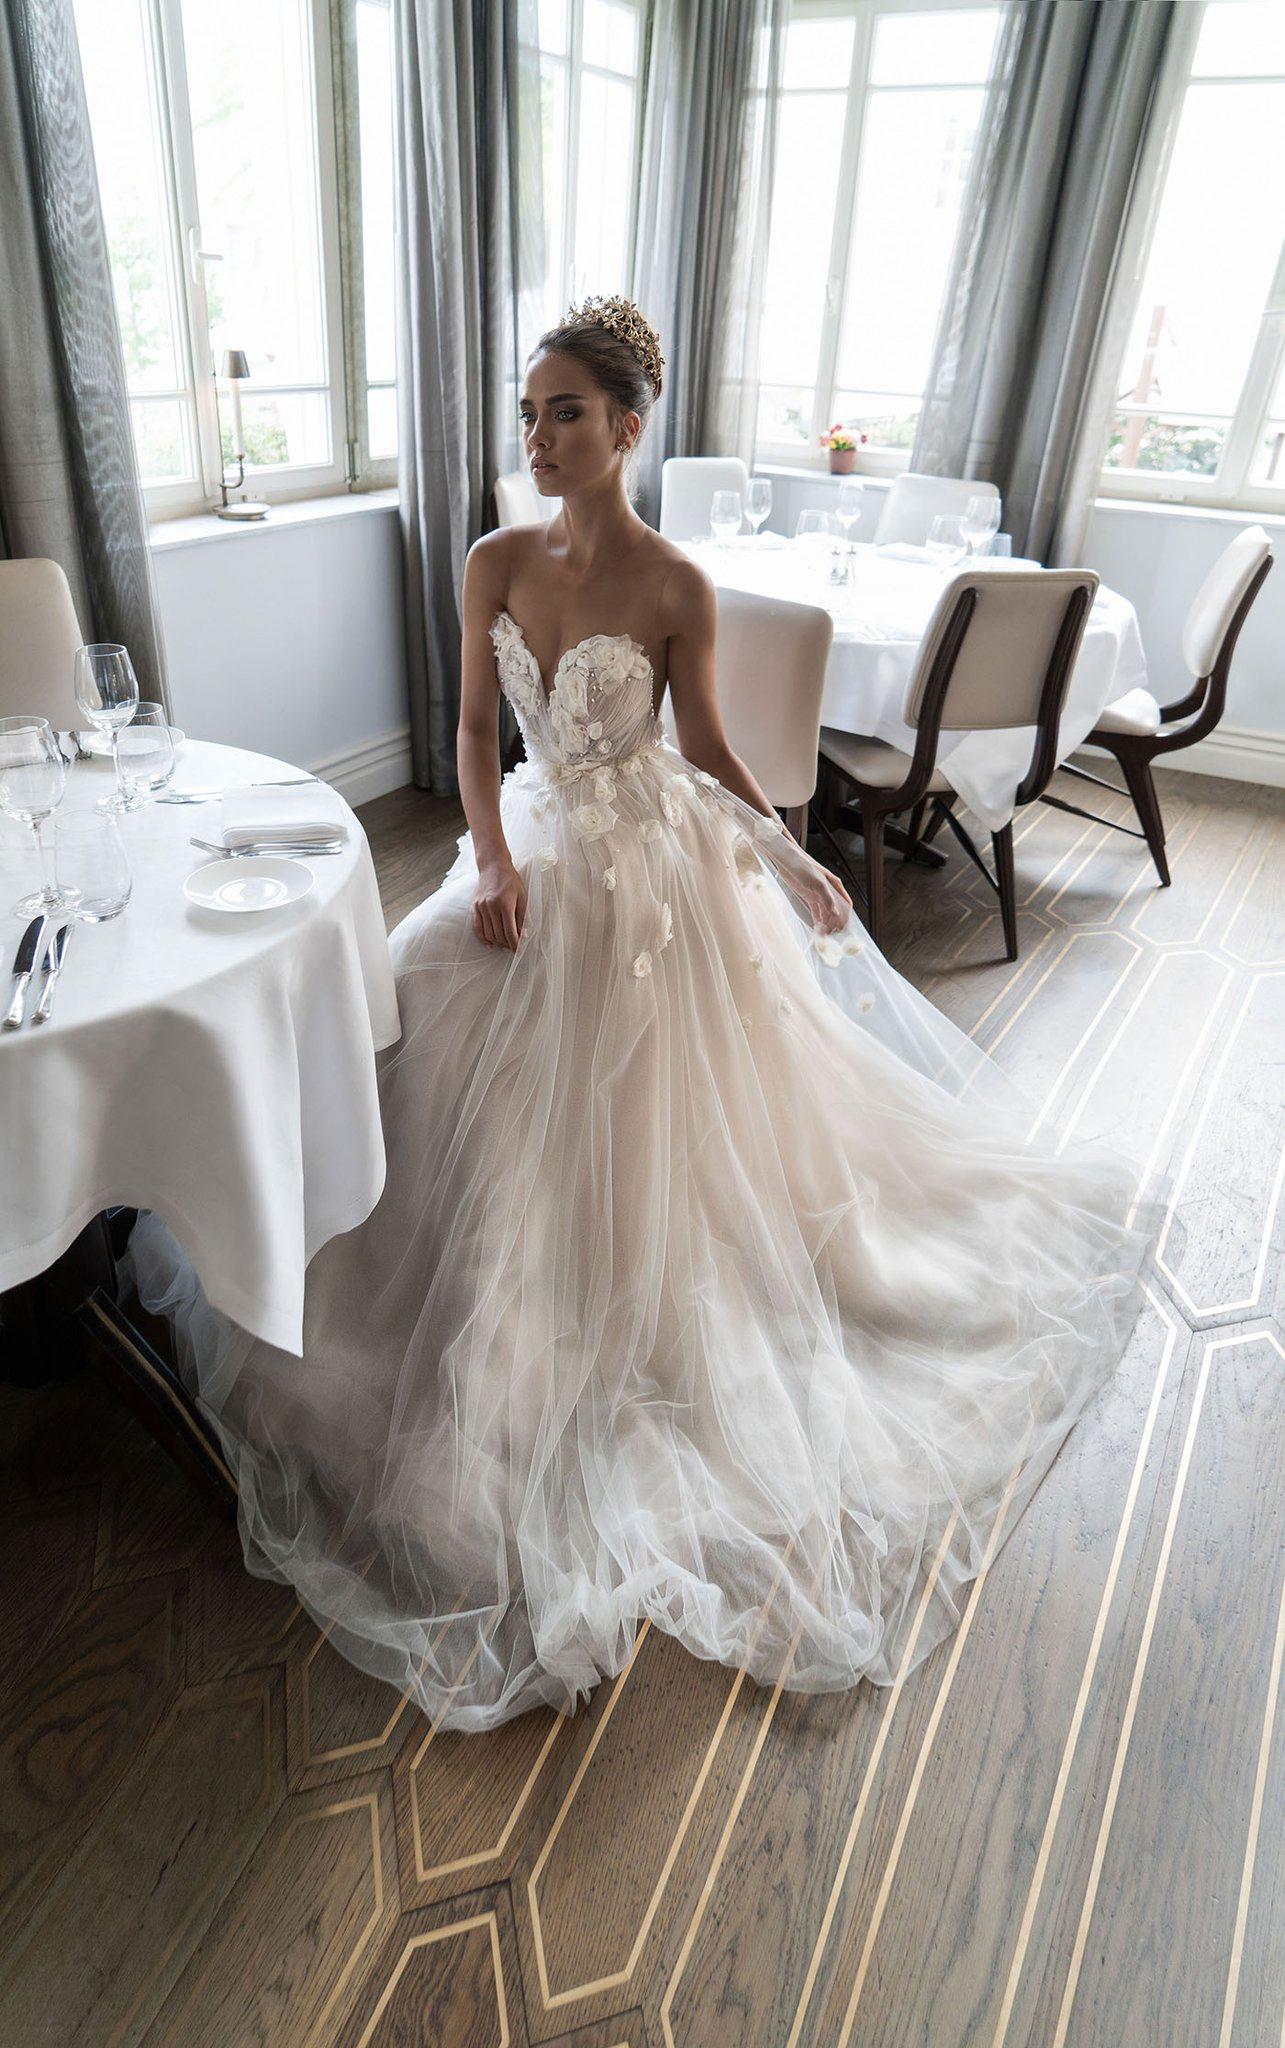 Pin by Rosa Isela Roque Arias on Wedding | Pinterest | Wedding dress ...